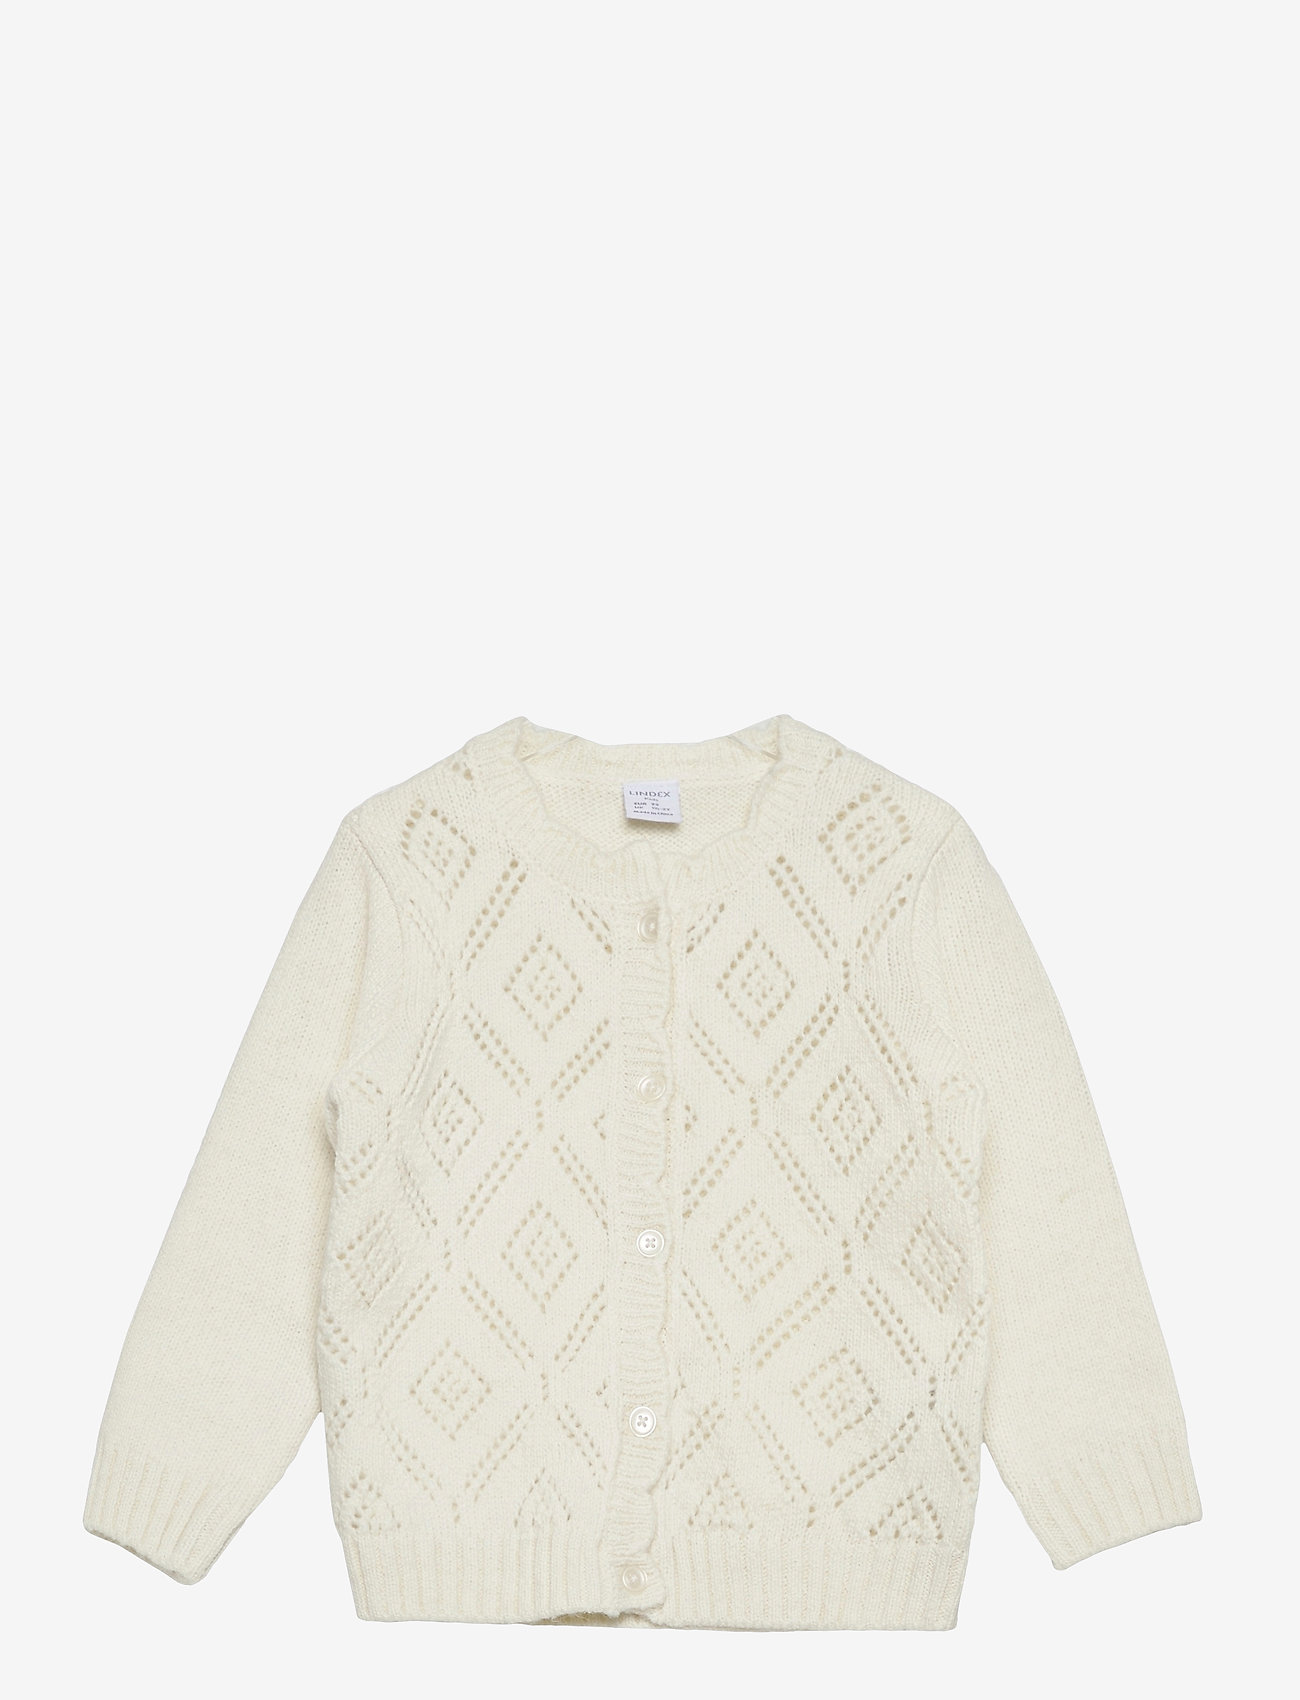 Lindex - Cardigan patternknit scallop e - gilets - white - 0